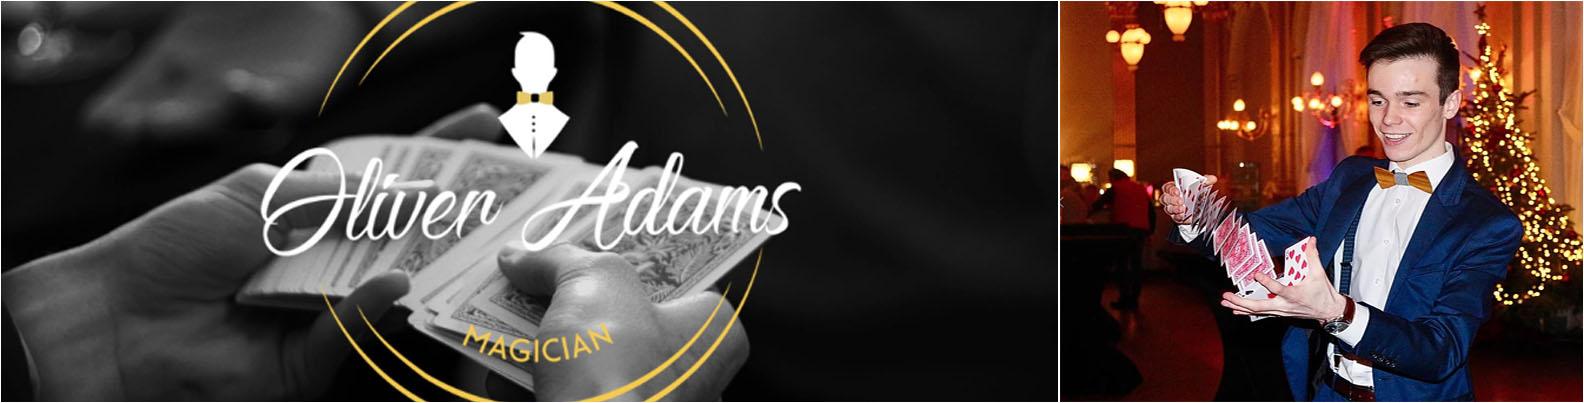 cover-partenaire-animation-magicien-oliver-adams